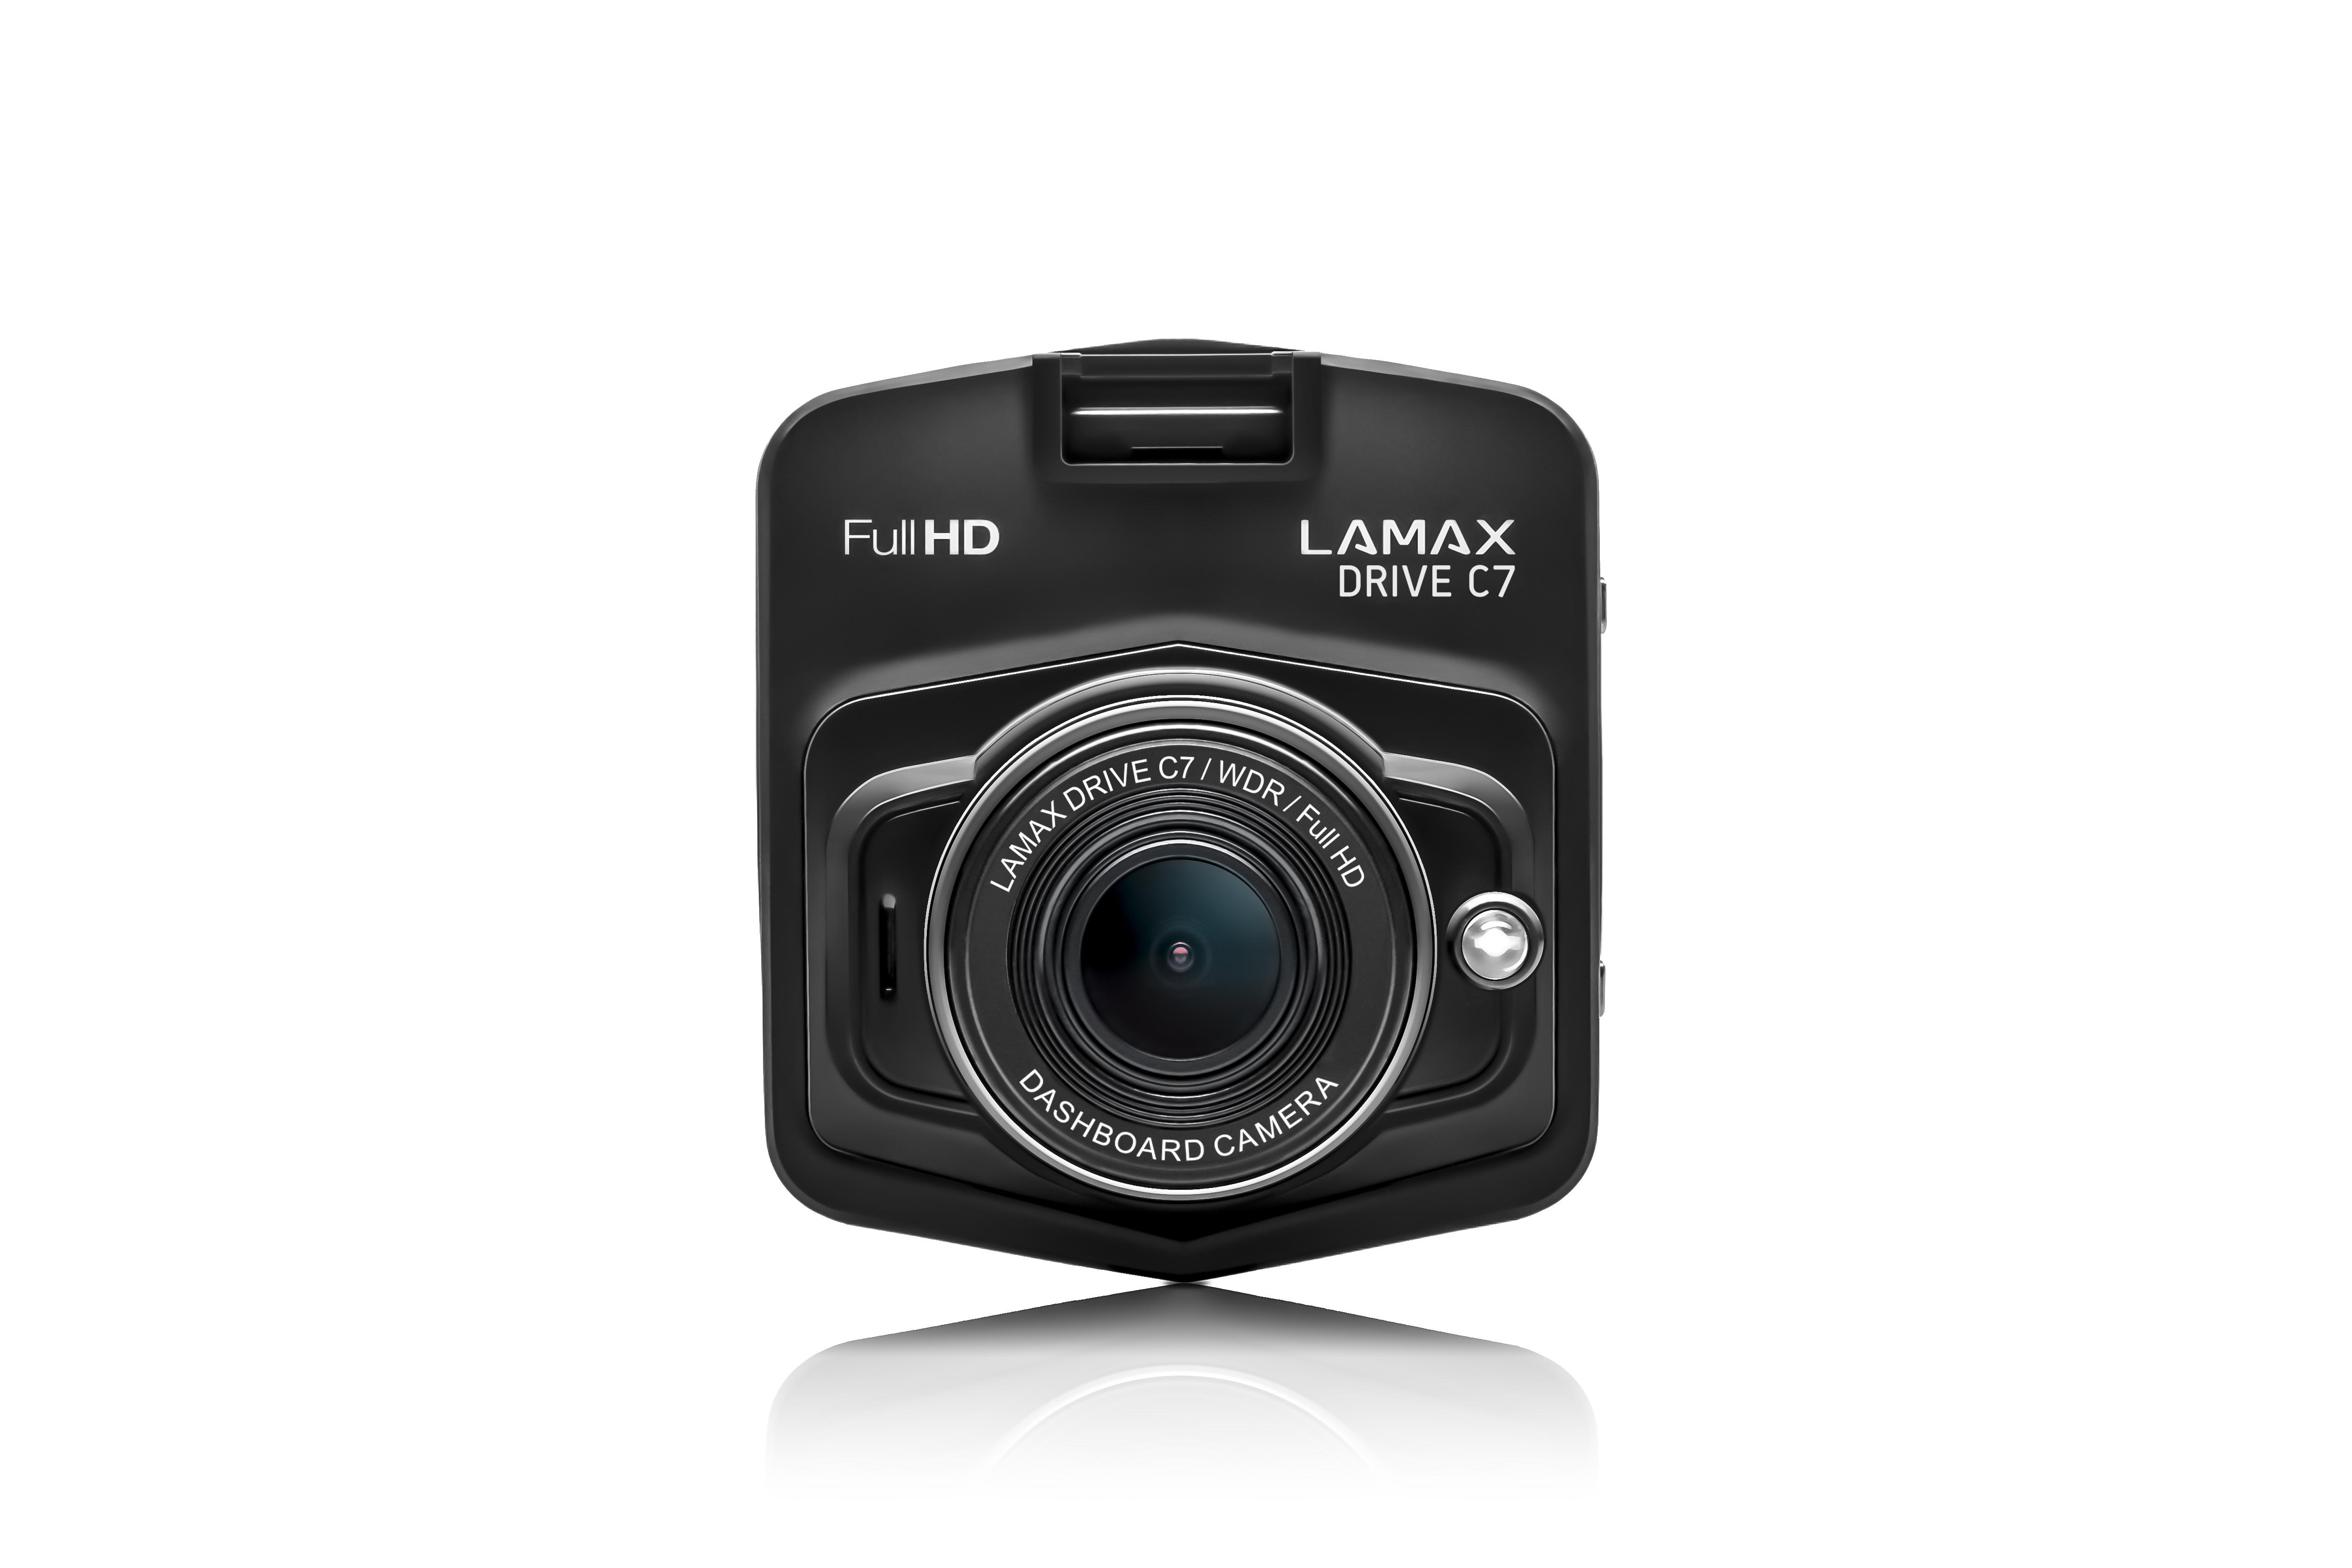 02-LAMAX-DRIVE-C5-8594175350319-fullHD.j